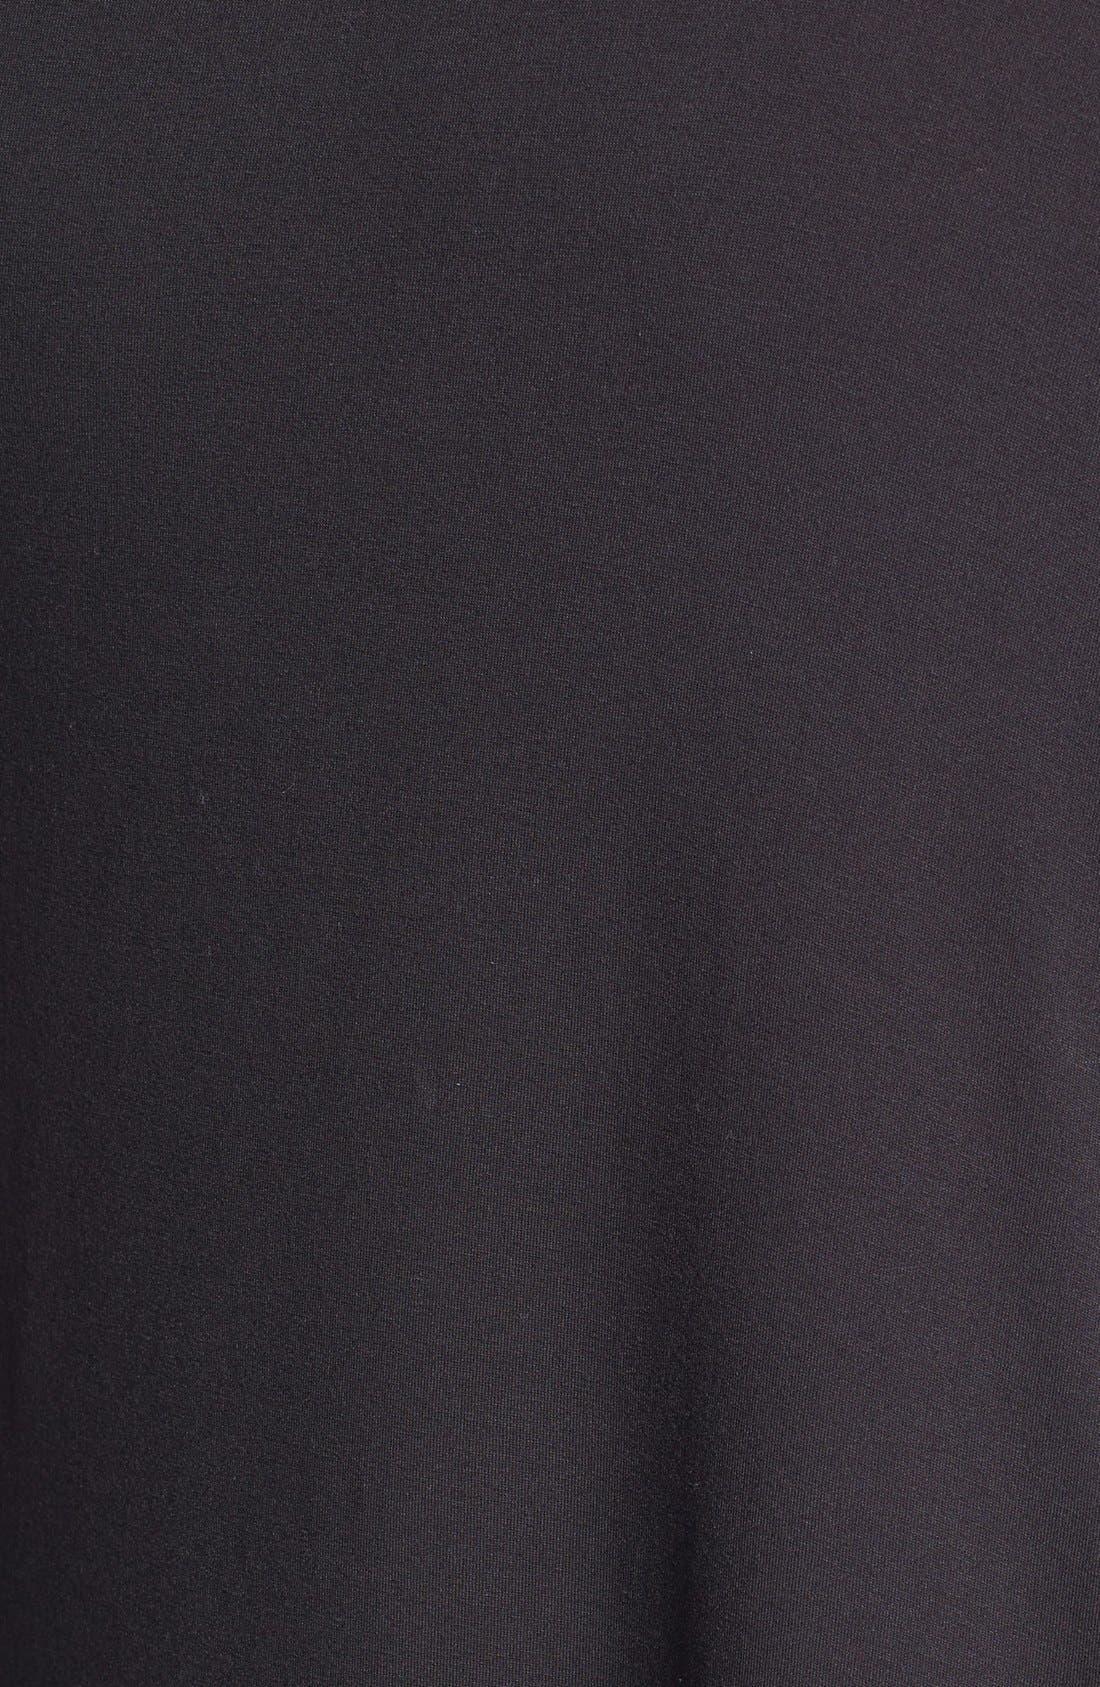 Alternate Image 3  - Rachel Zoe 'Azur' One Shoulder Jersey Maxi Dress